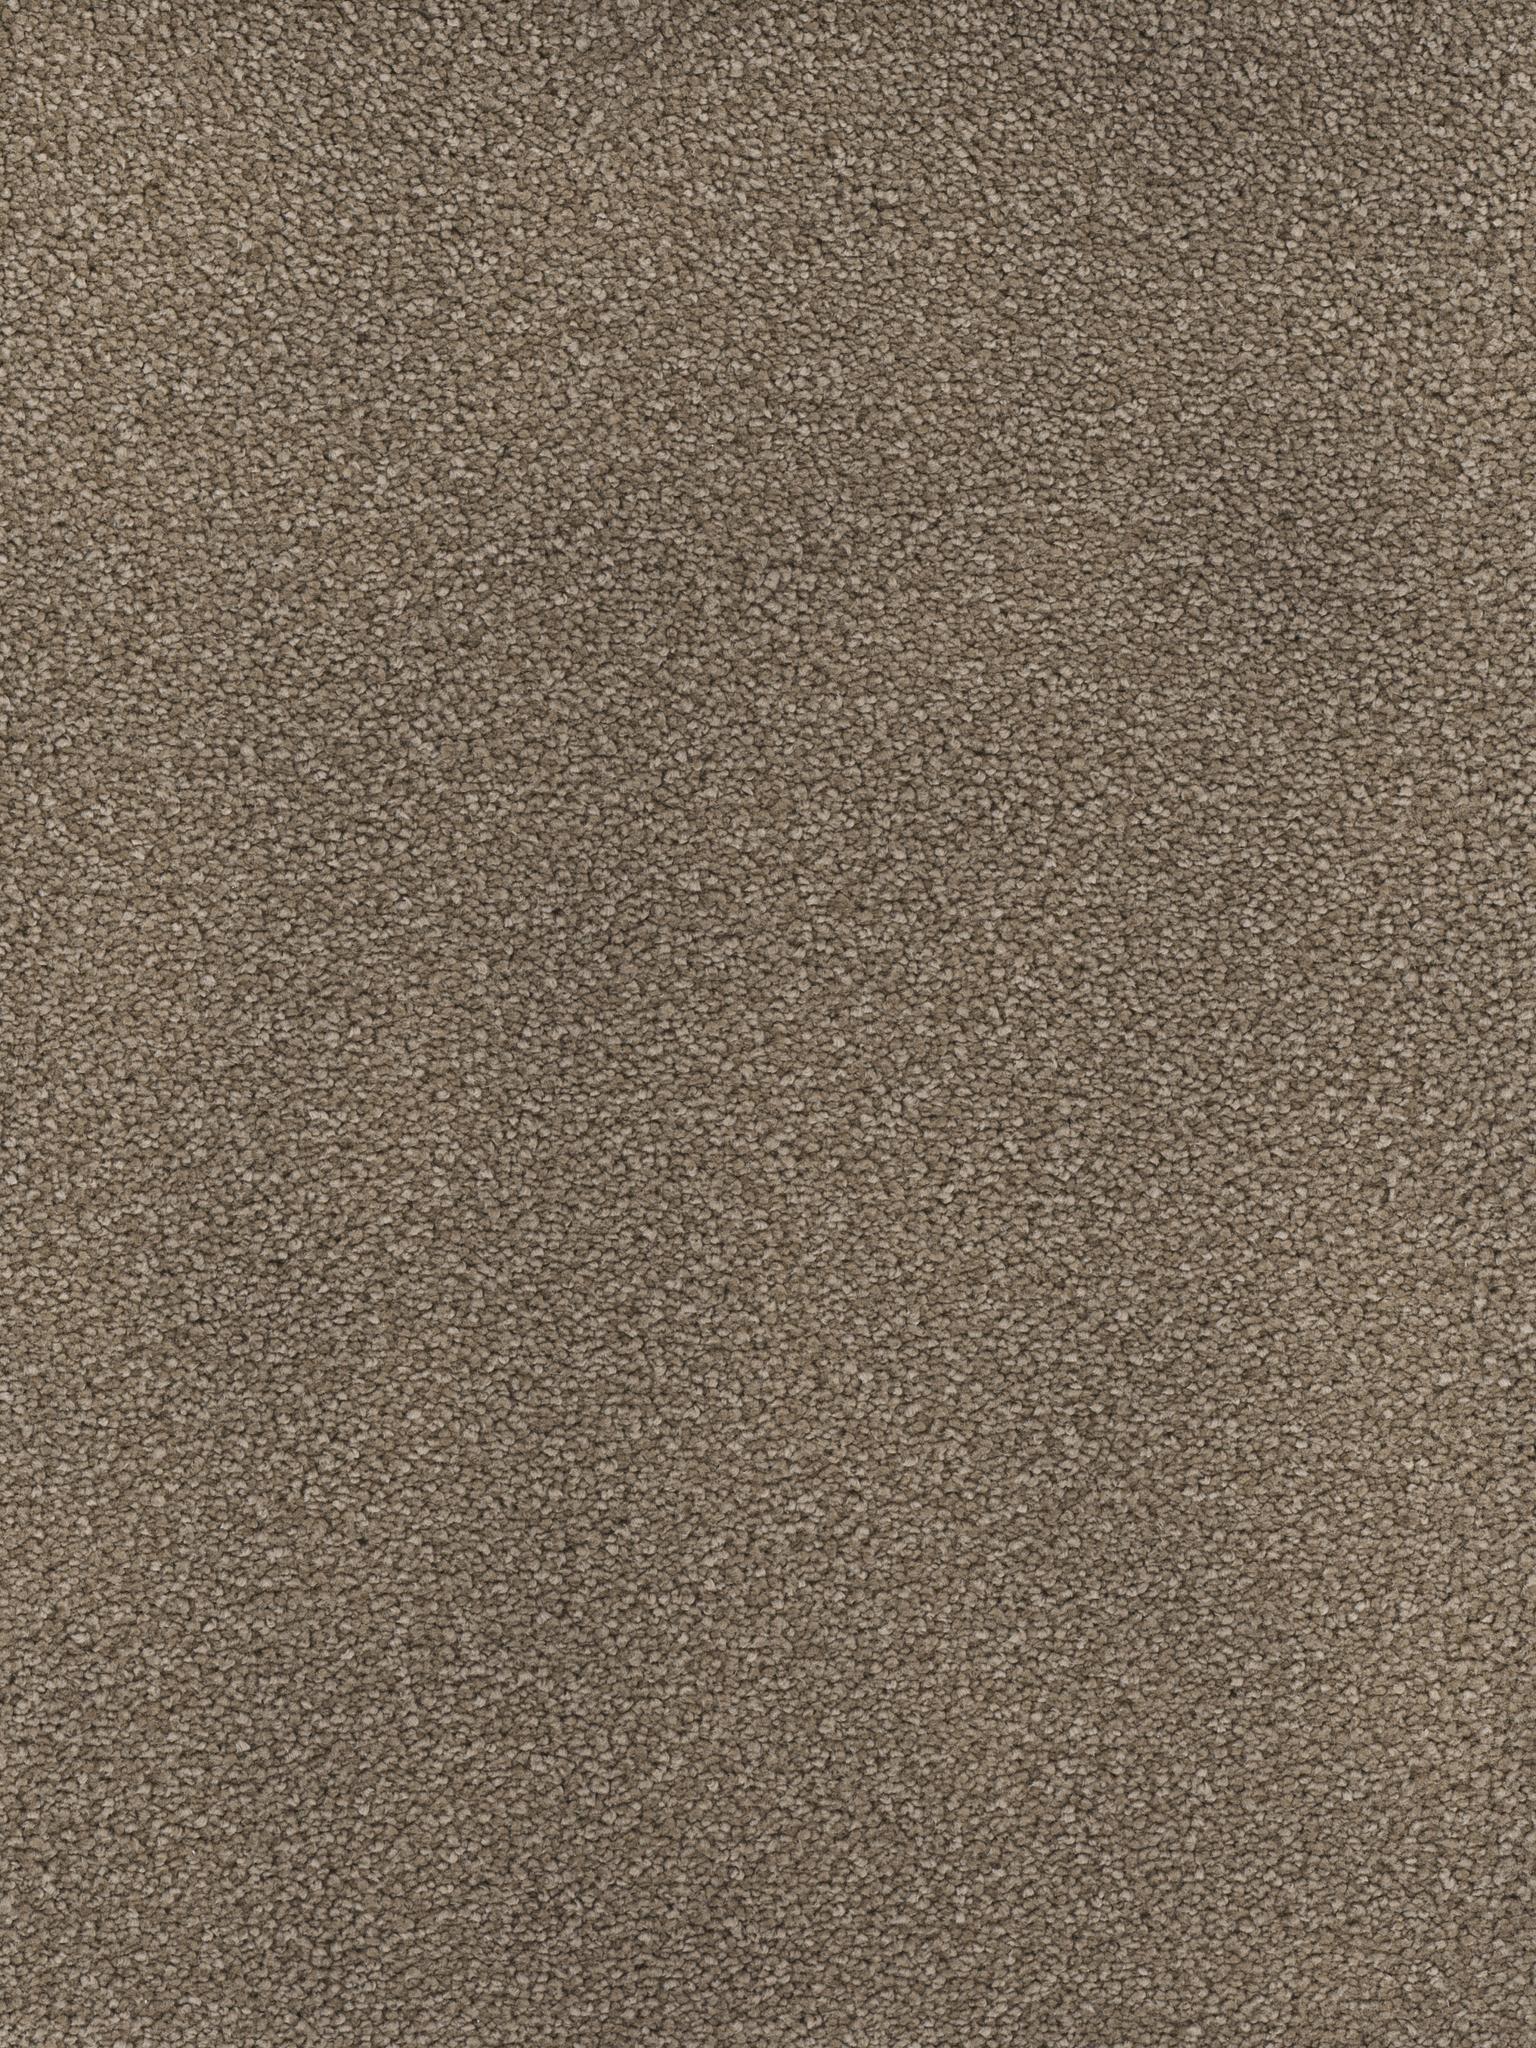 Montauk Carpet 2560 Carpet Vidalondon